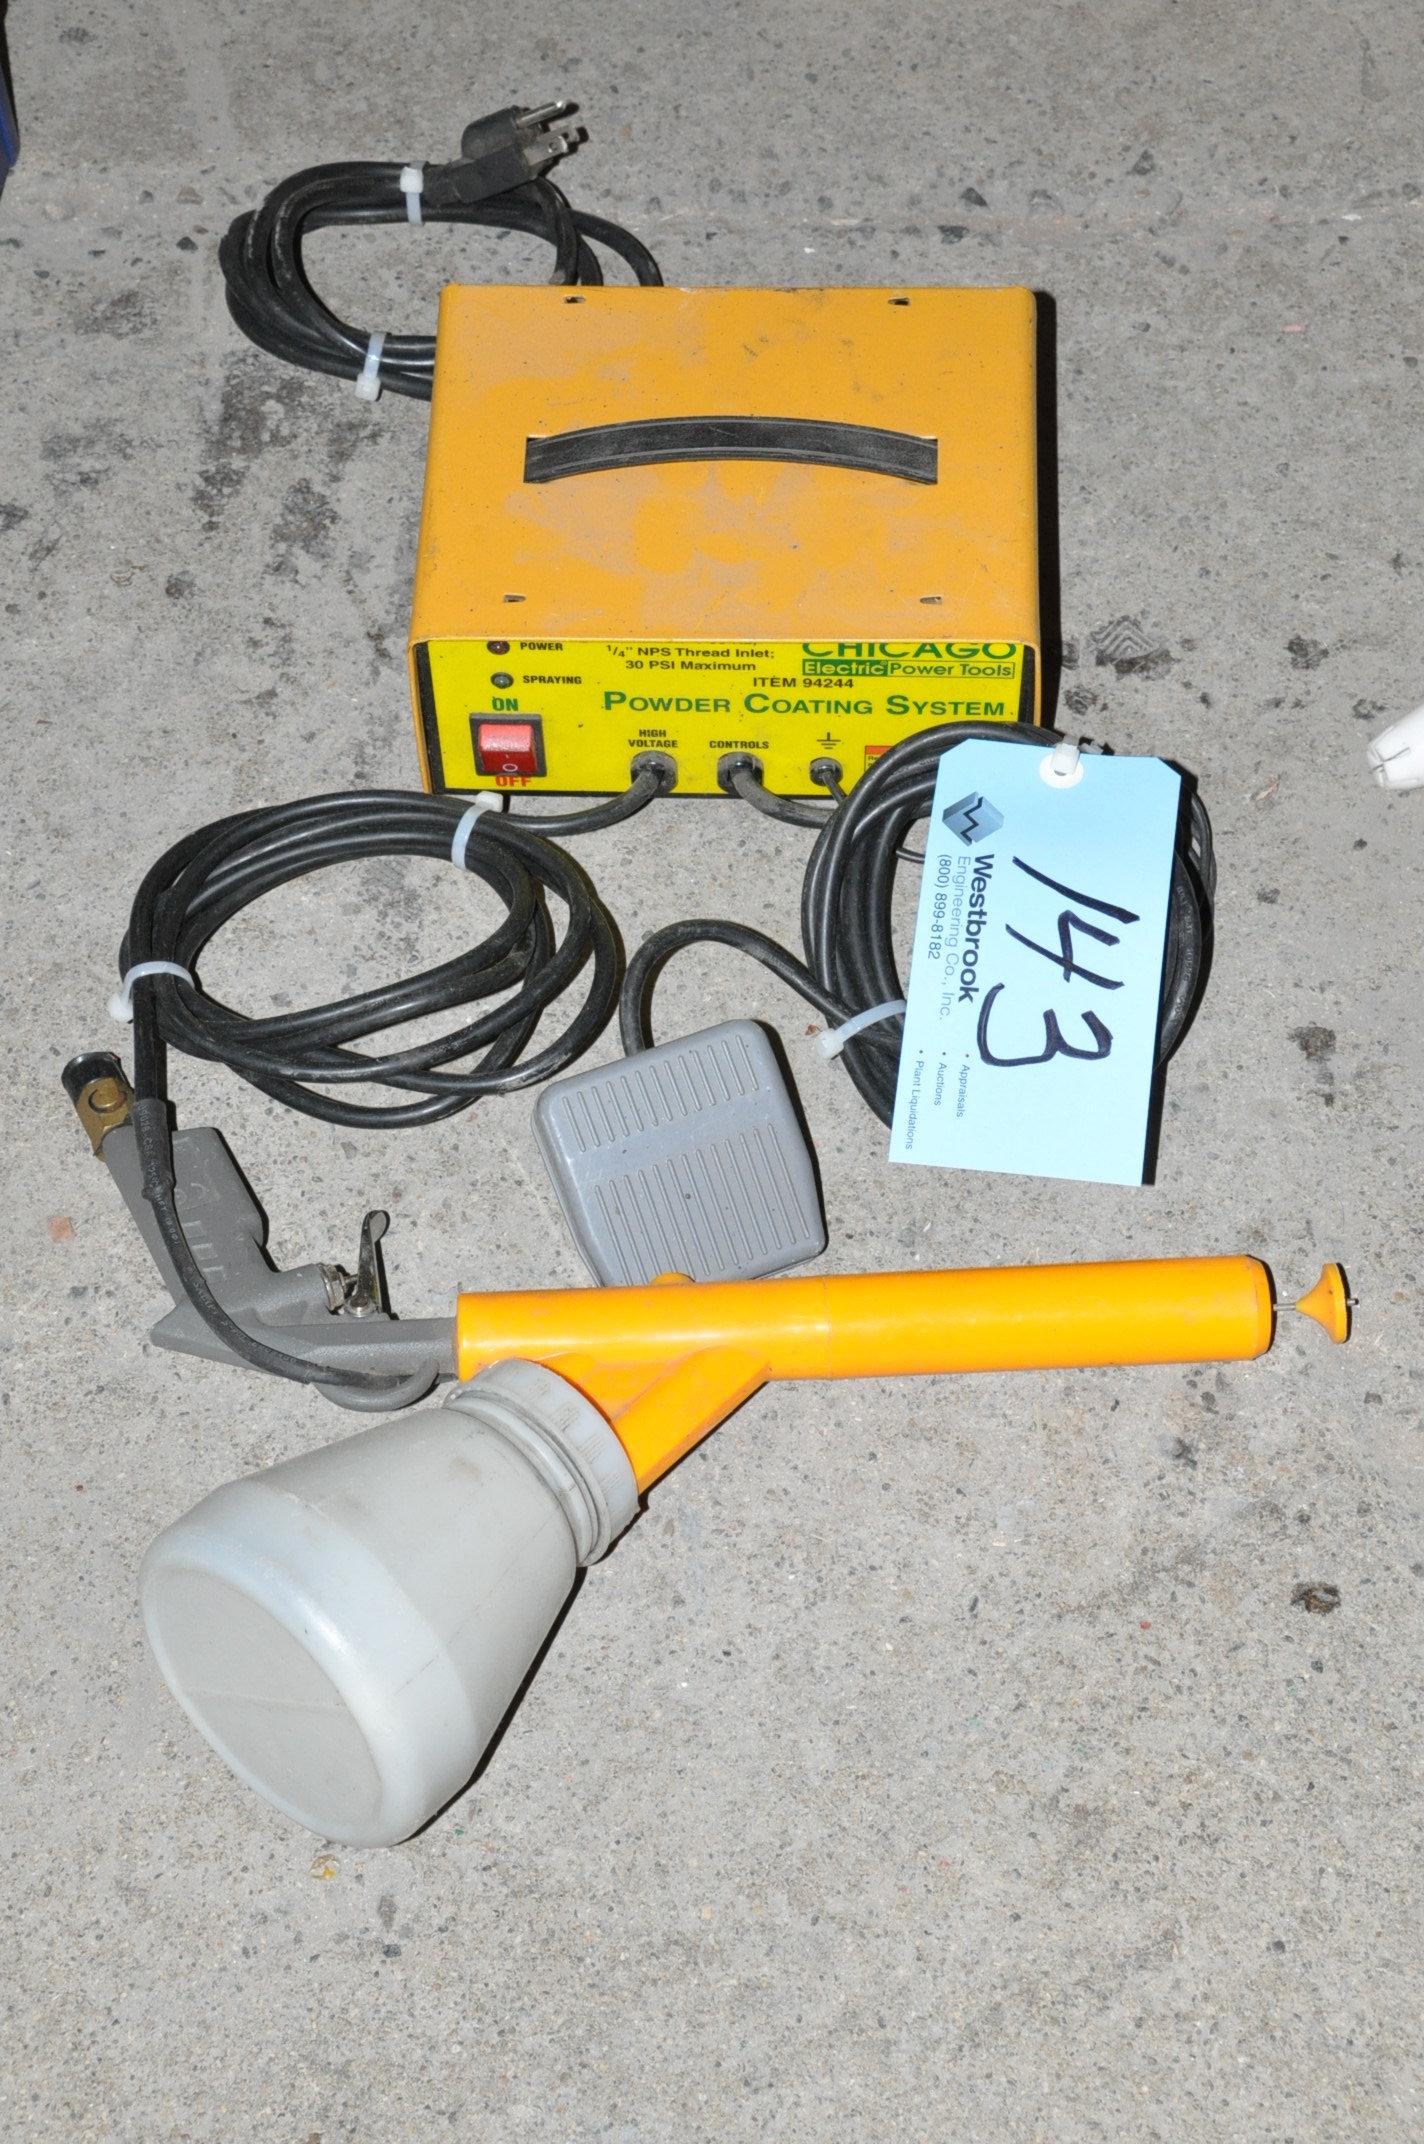 Chicago 94244, Electric Powder Coating Spray Gun System